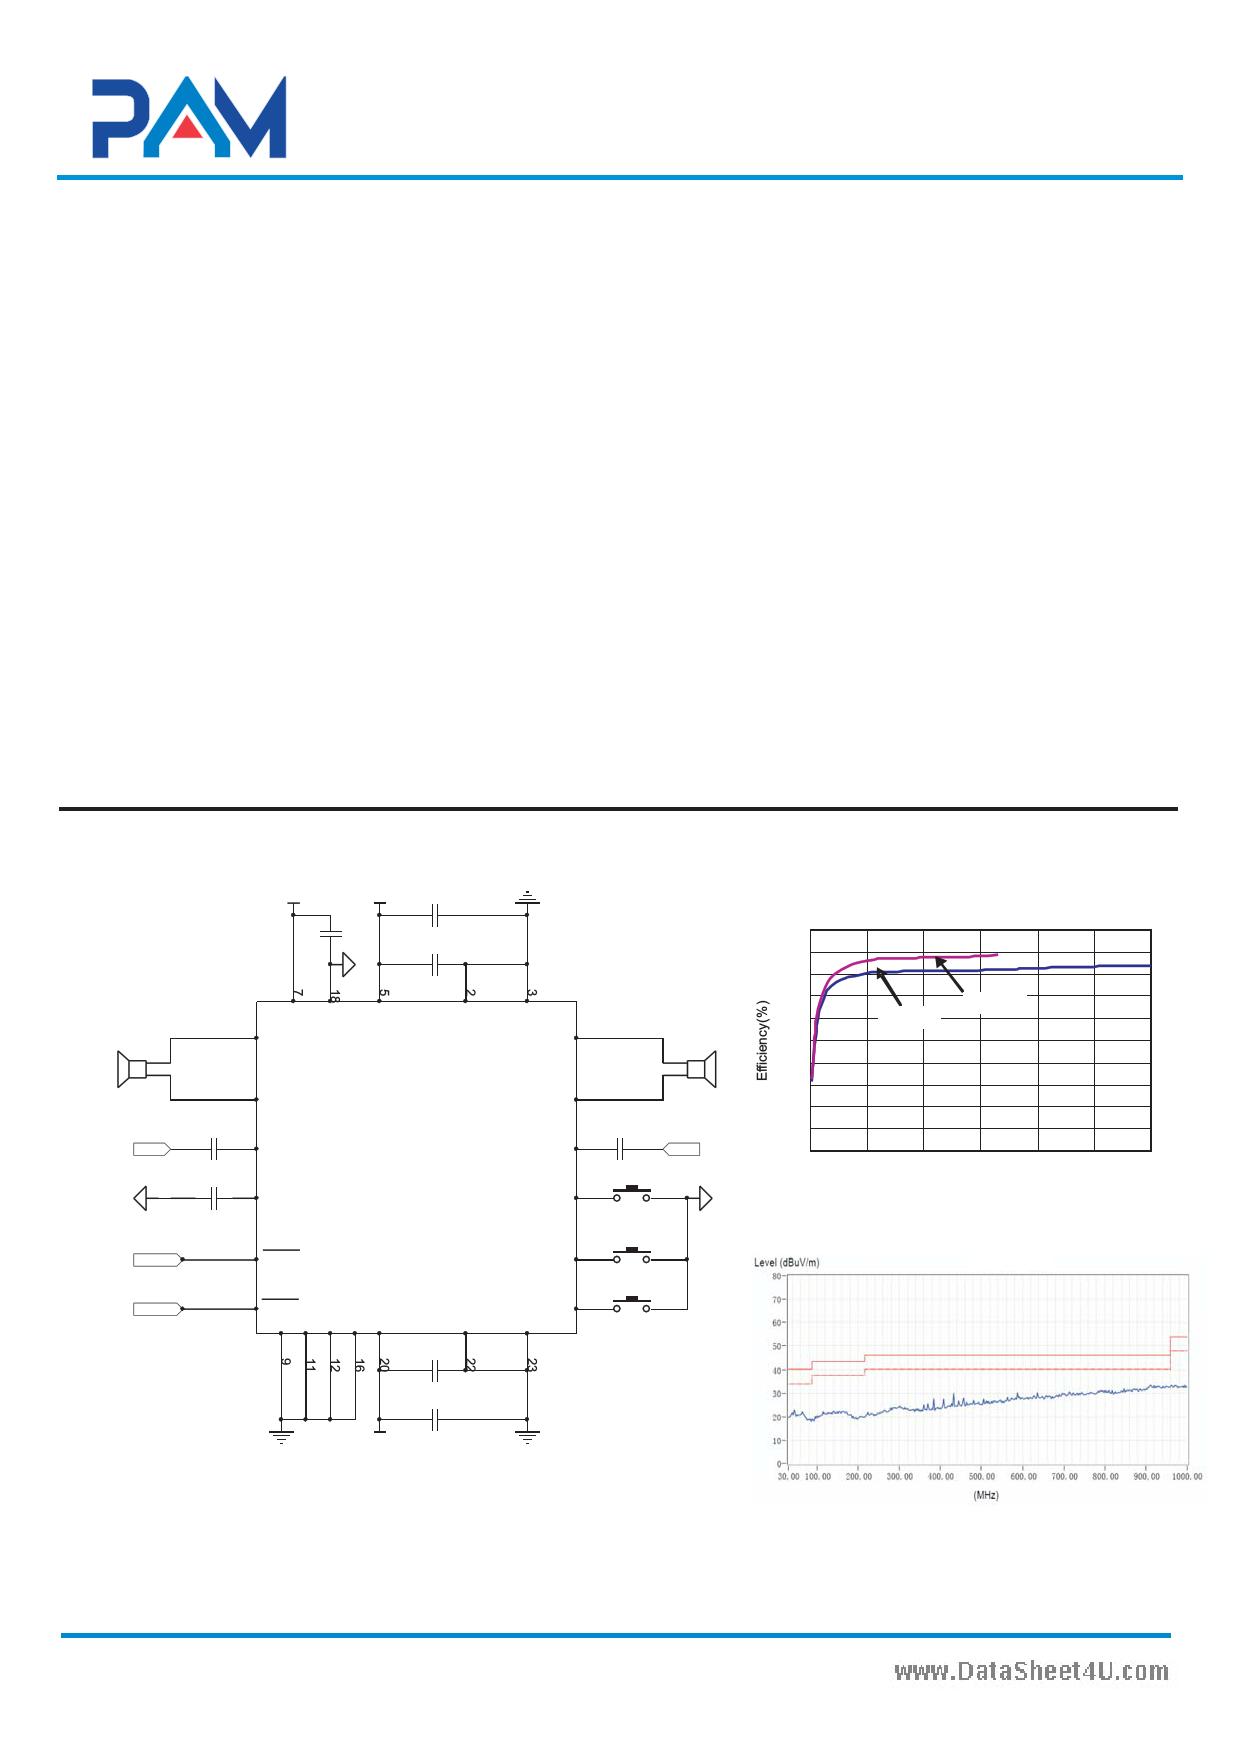 PAM8803S دیتاشیت PDF